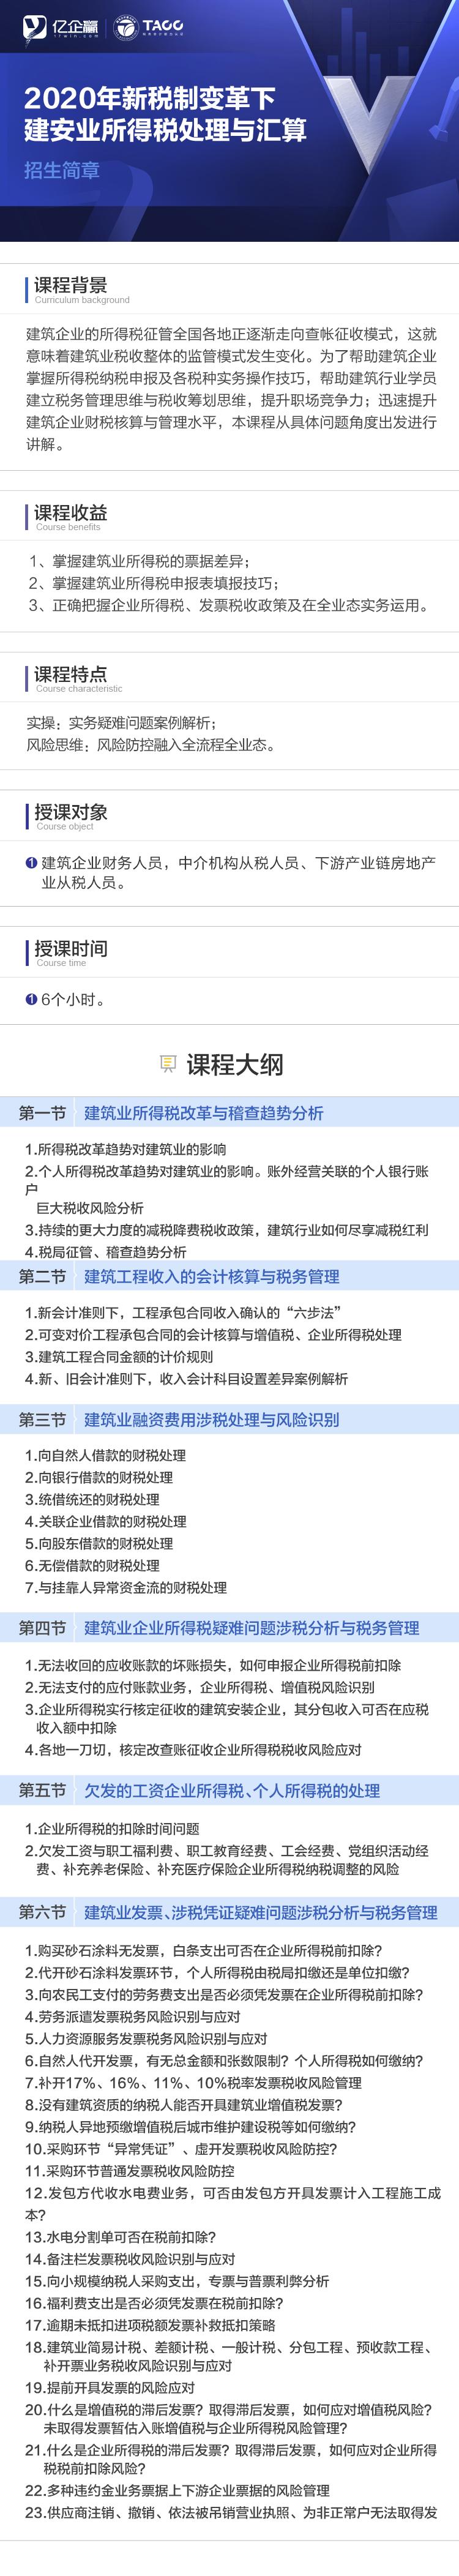 750-招生简章.png